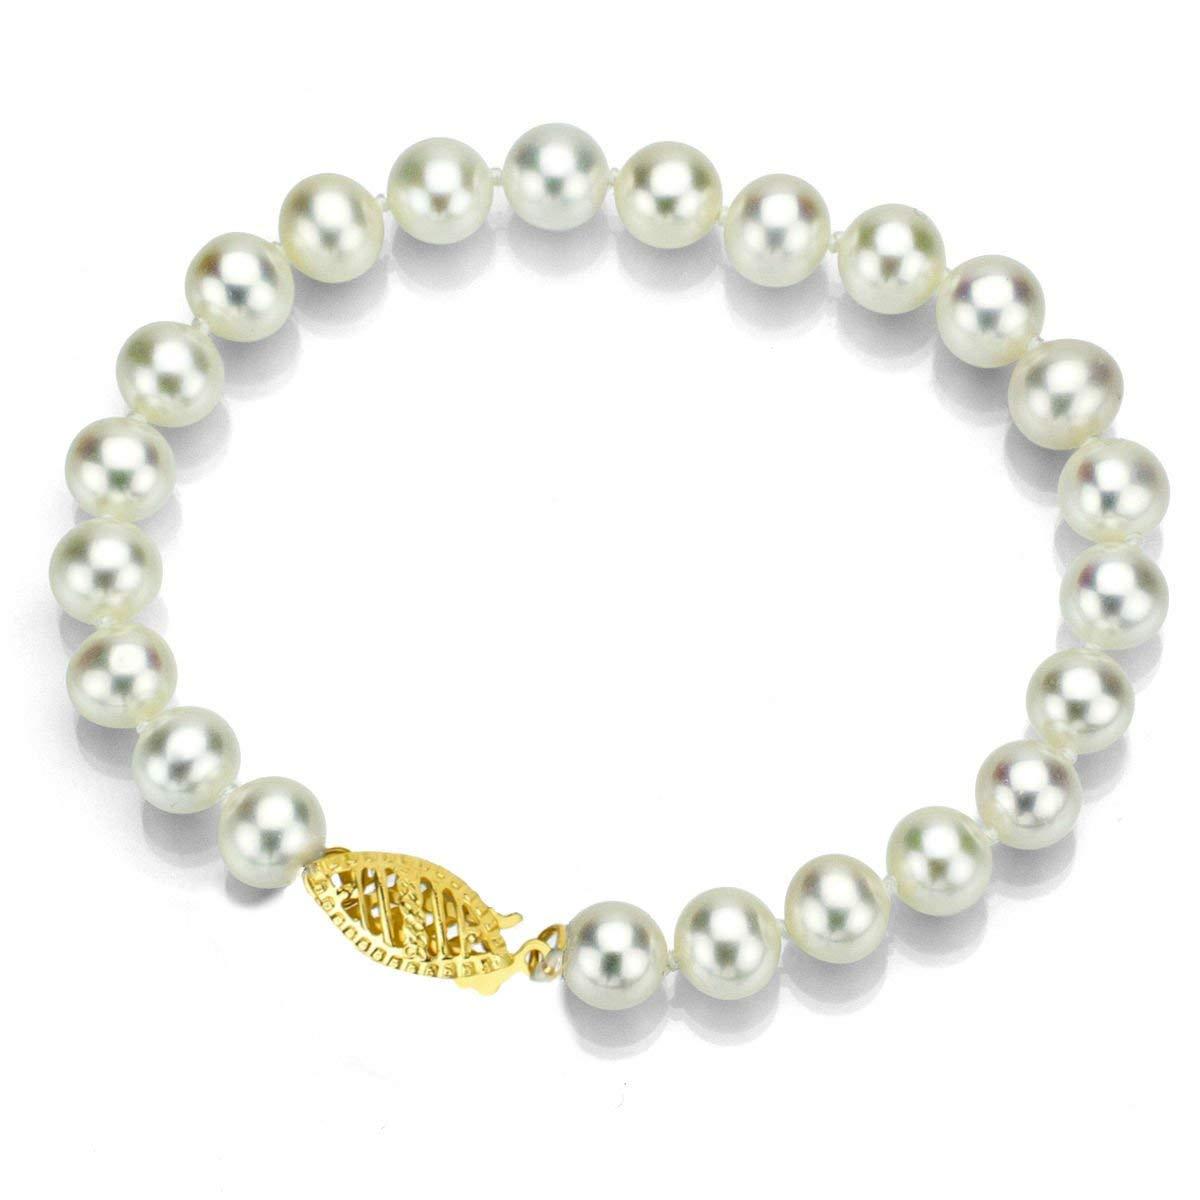 "La Regis Jewelry 14k Yellow Gold 8-8.5mm White Freshwater Cultured High Luster Pearl Bracelet, 7"""